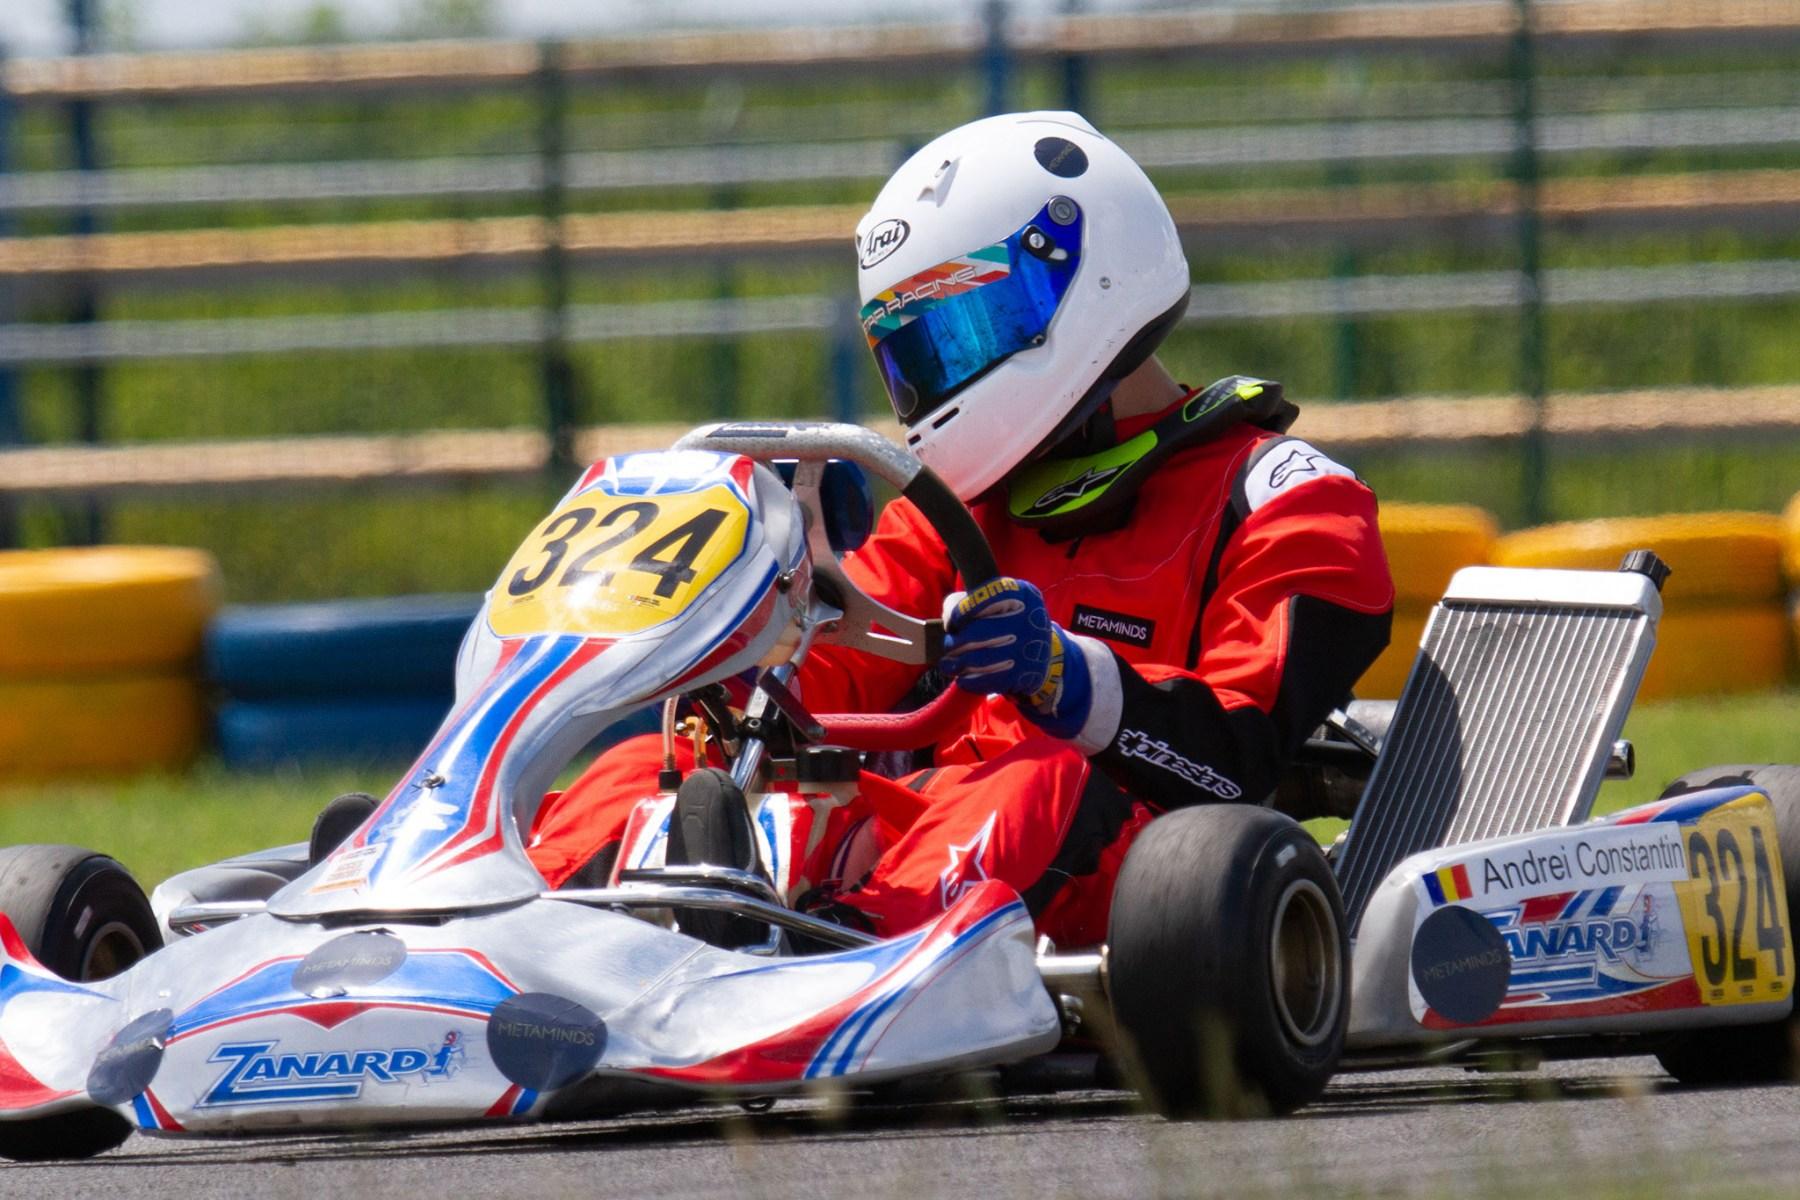 KartingMasters - Etapa 1 - Bucuresti - 2020